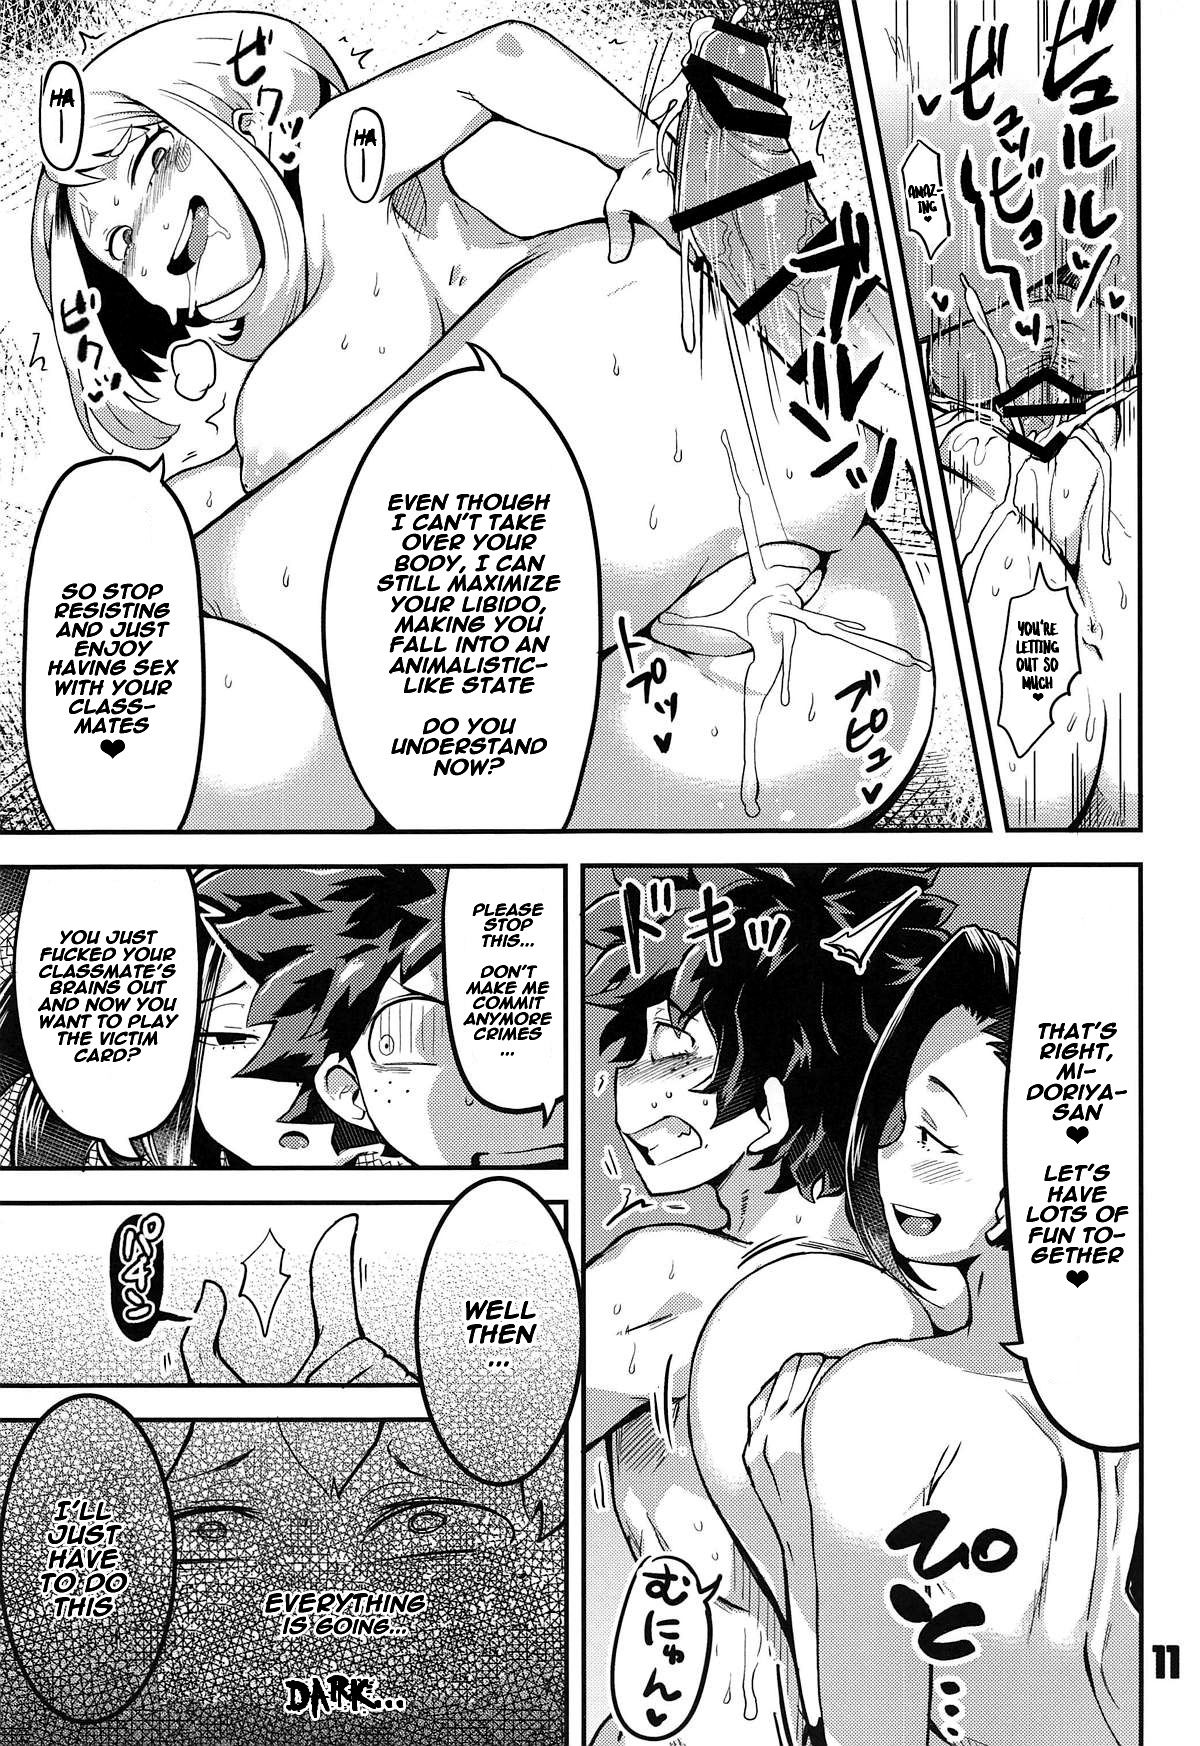 Boku to nottori villain nakademia hentai manga picture 10